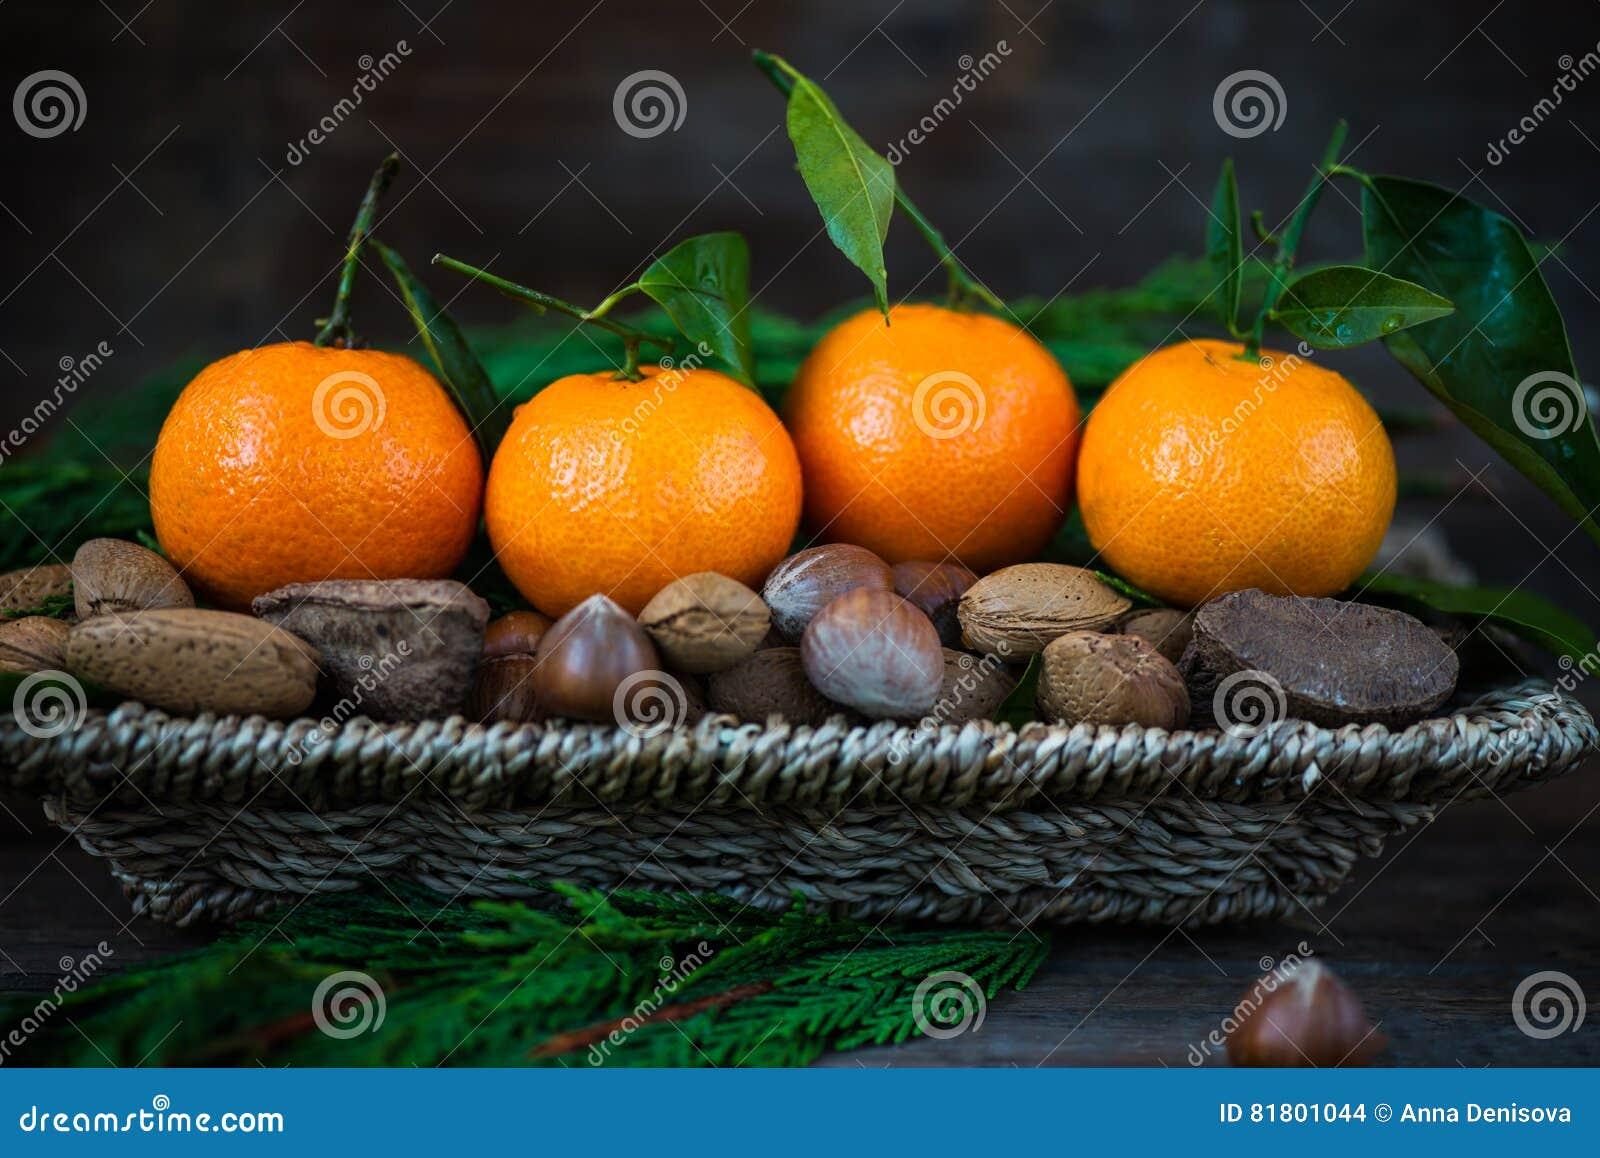 Свежие Клементины или Tangerines в корзине